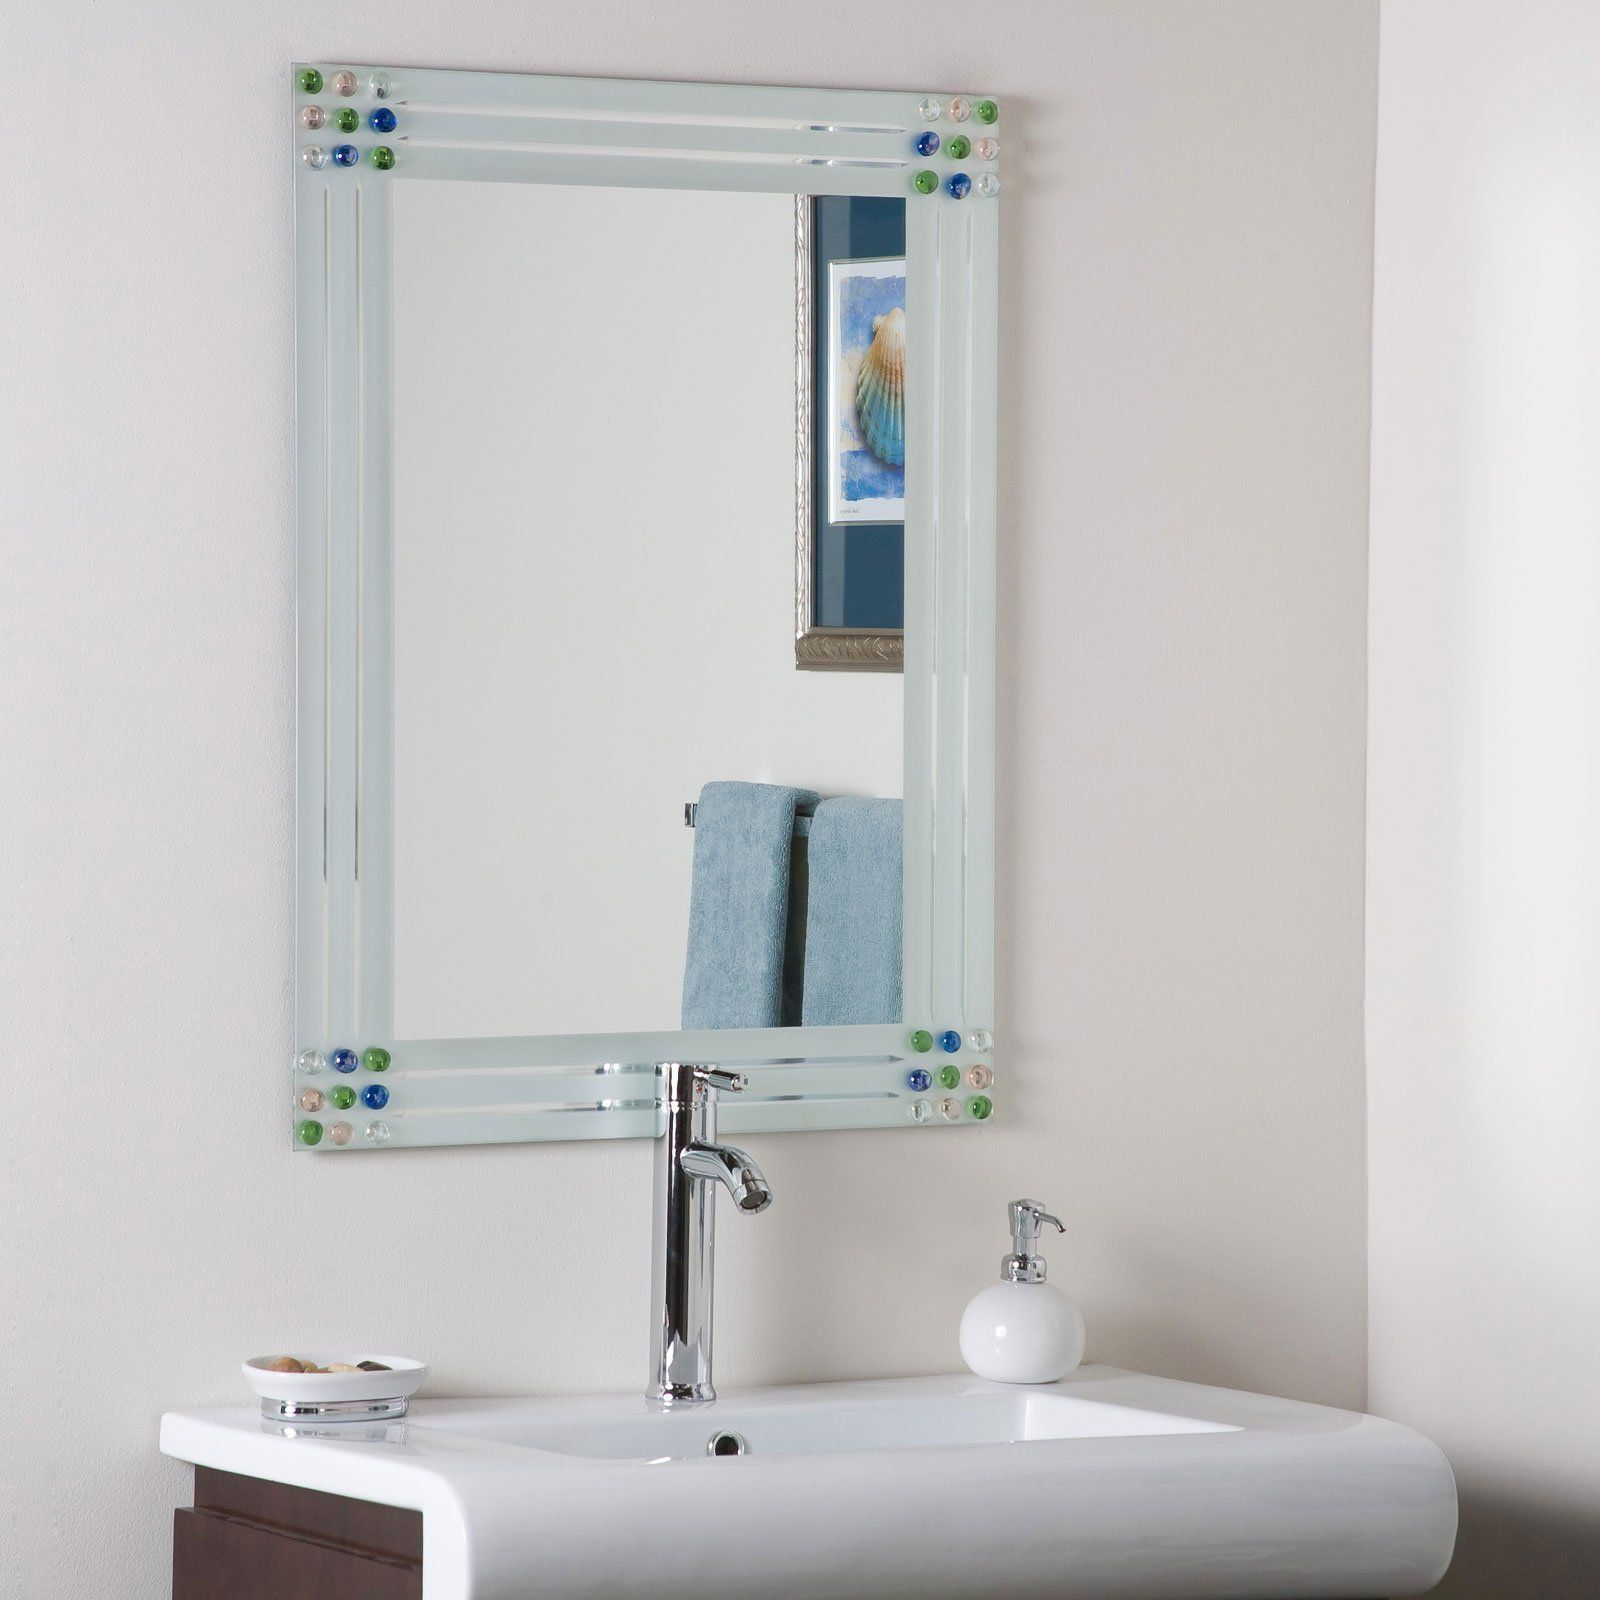 Bejeweled Frameless Bathroom Mirror | Bathroom mirrors, Mirror ...